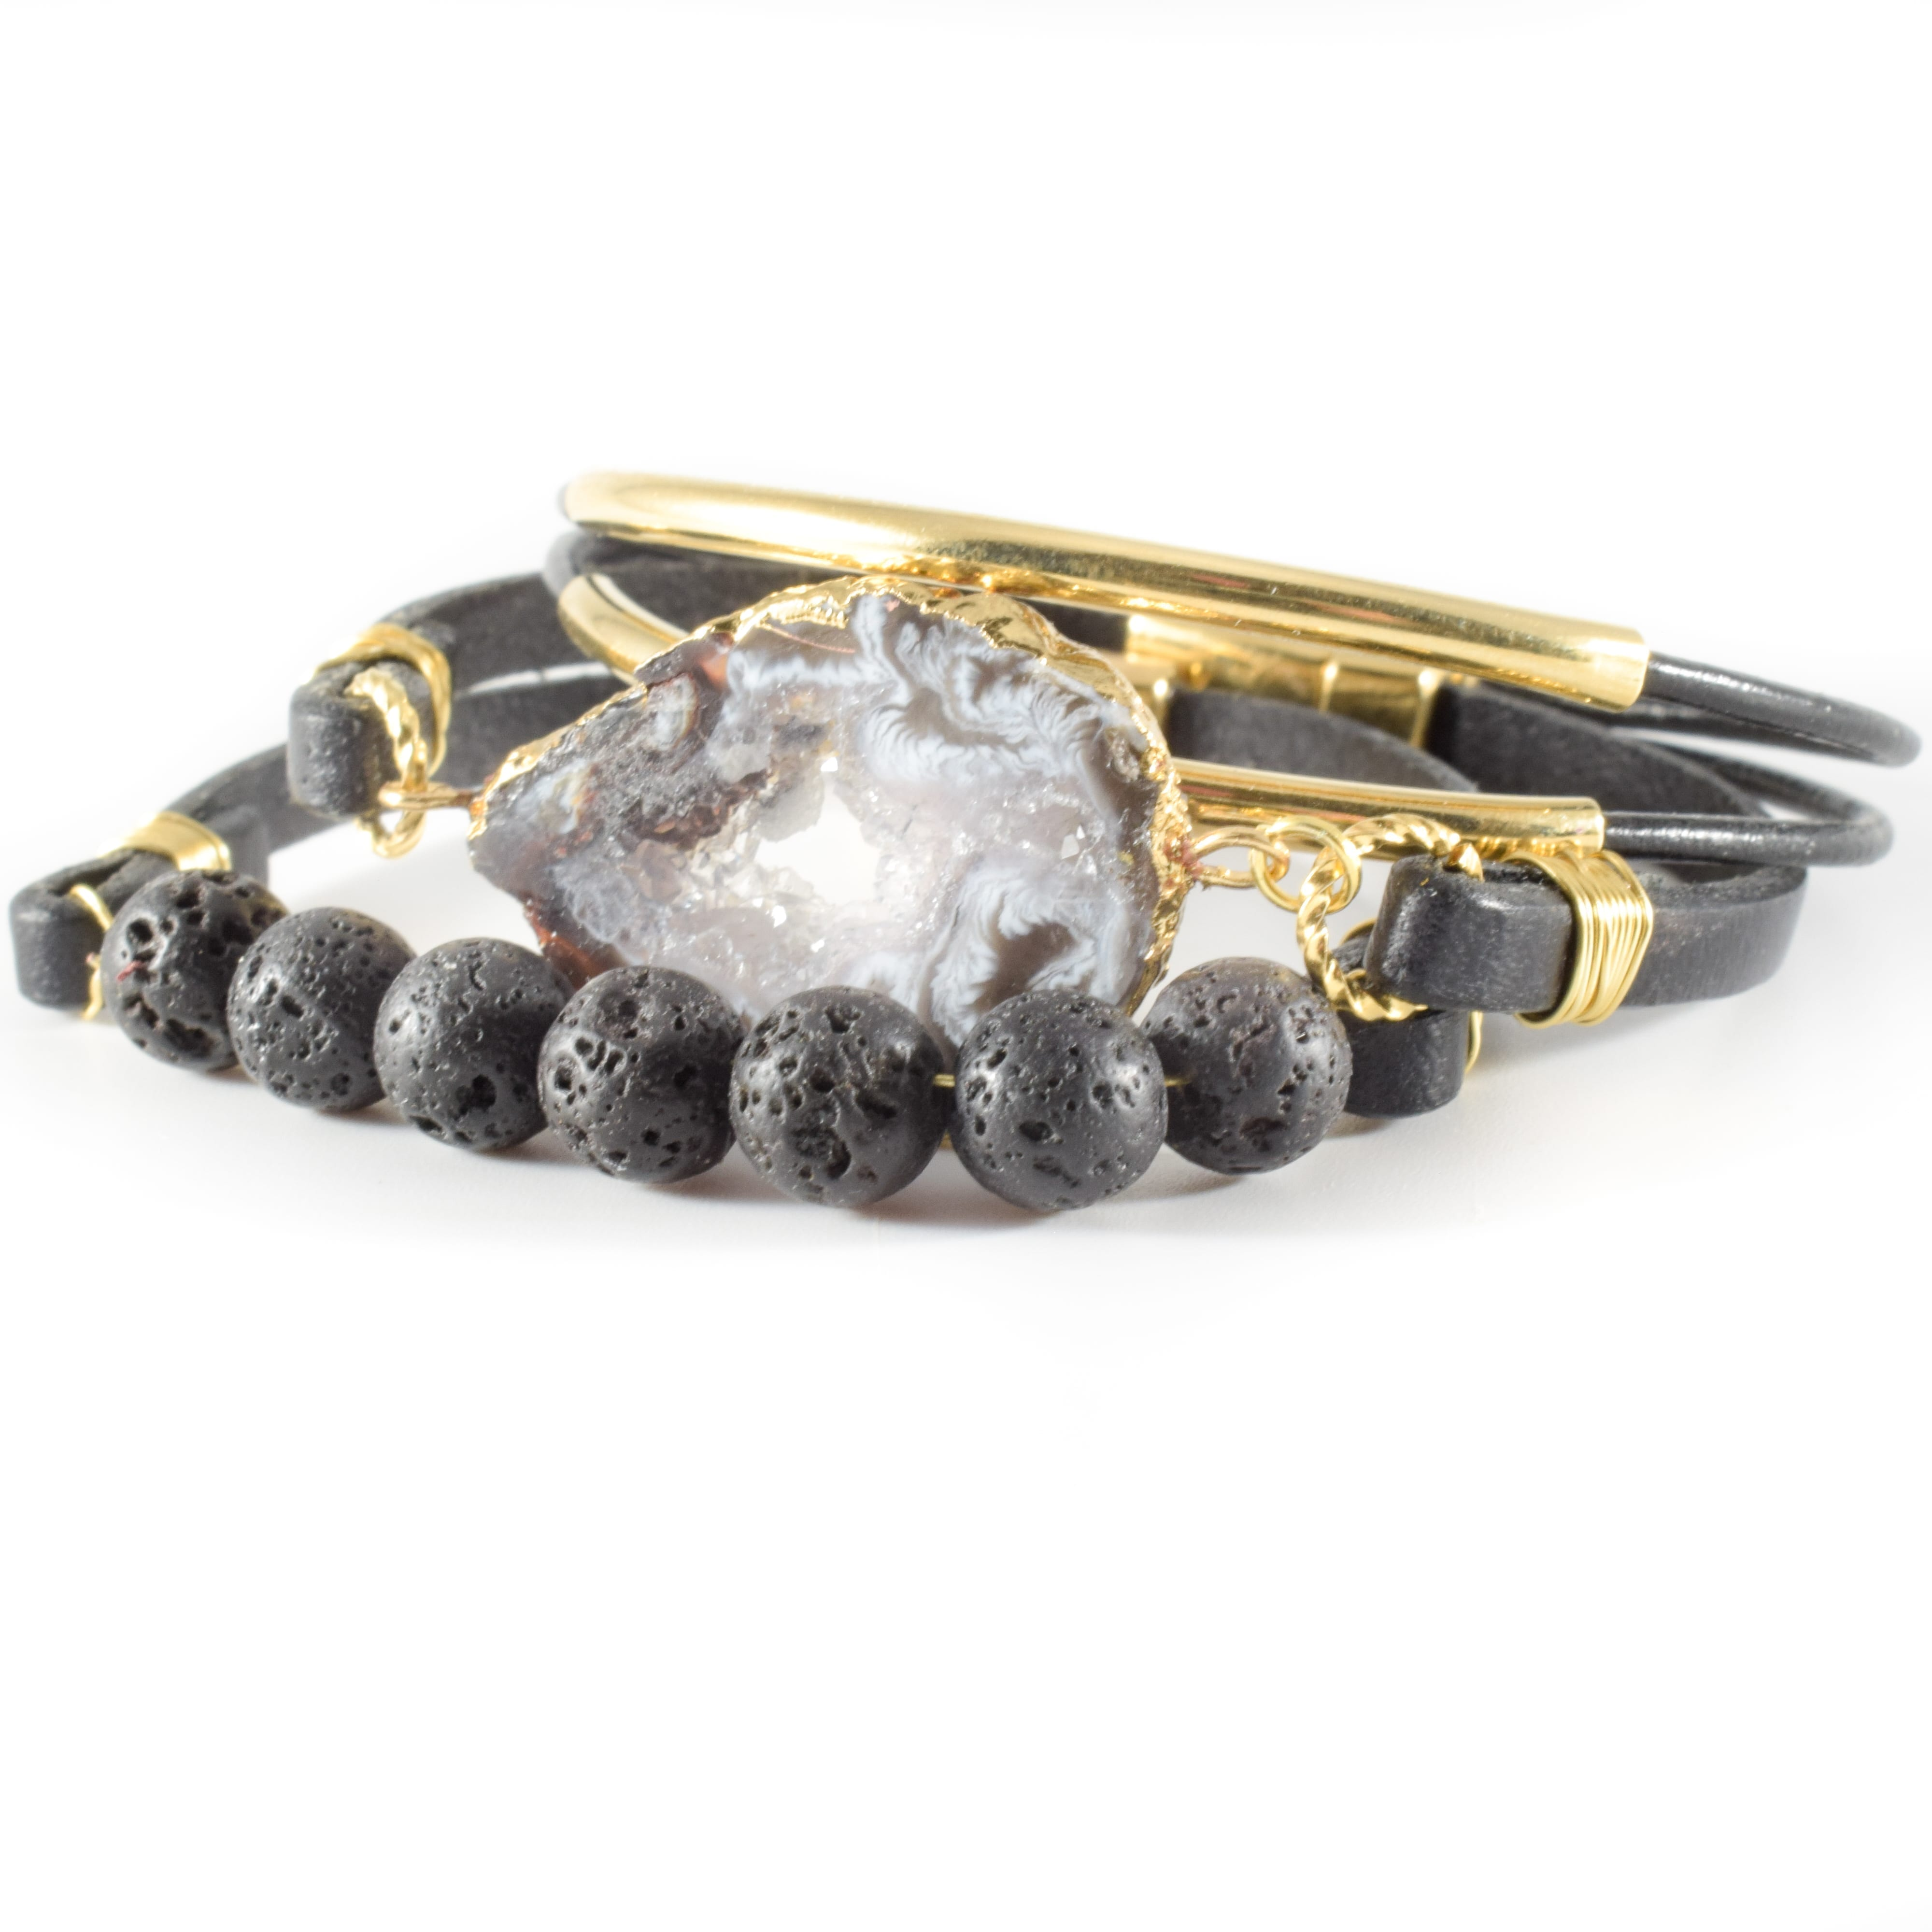 Druzy bracelet set